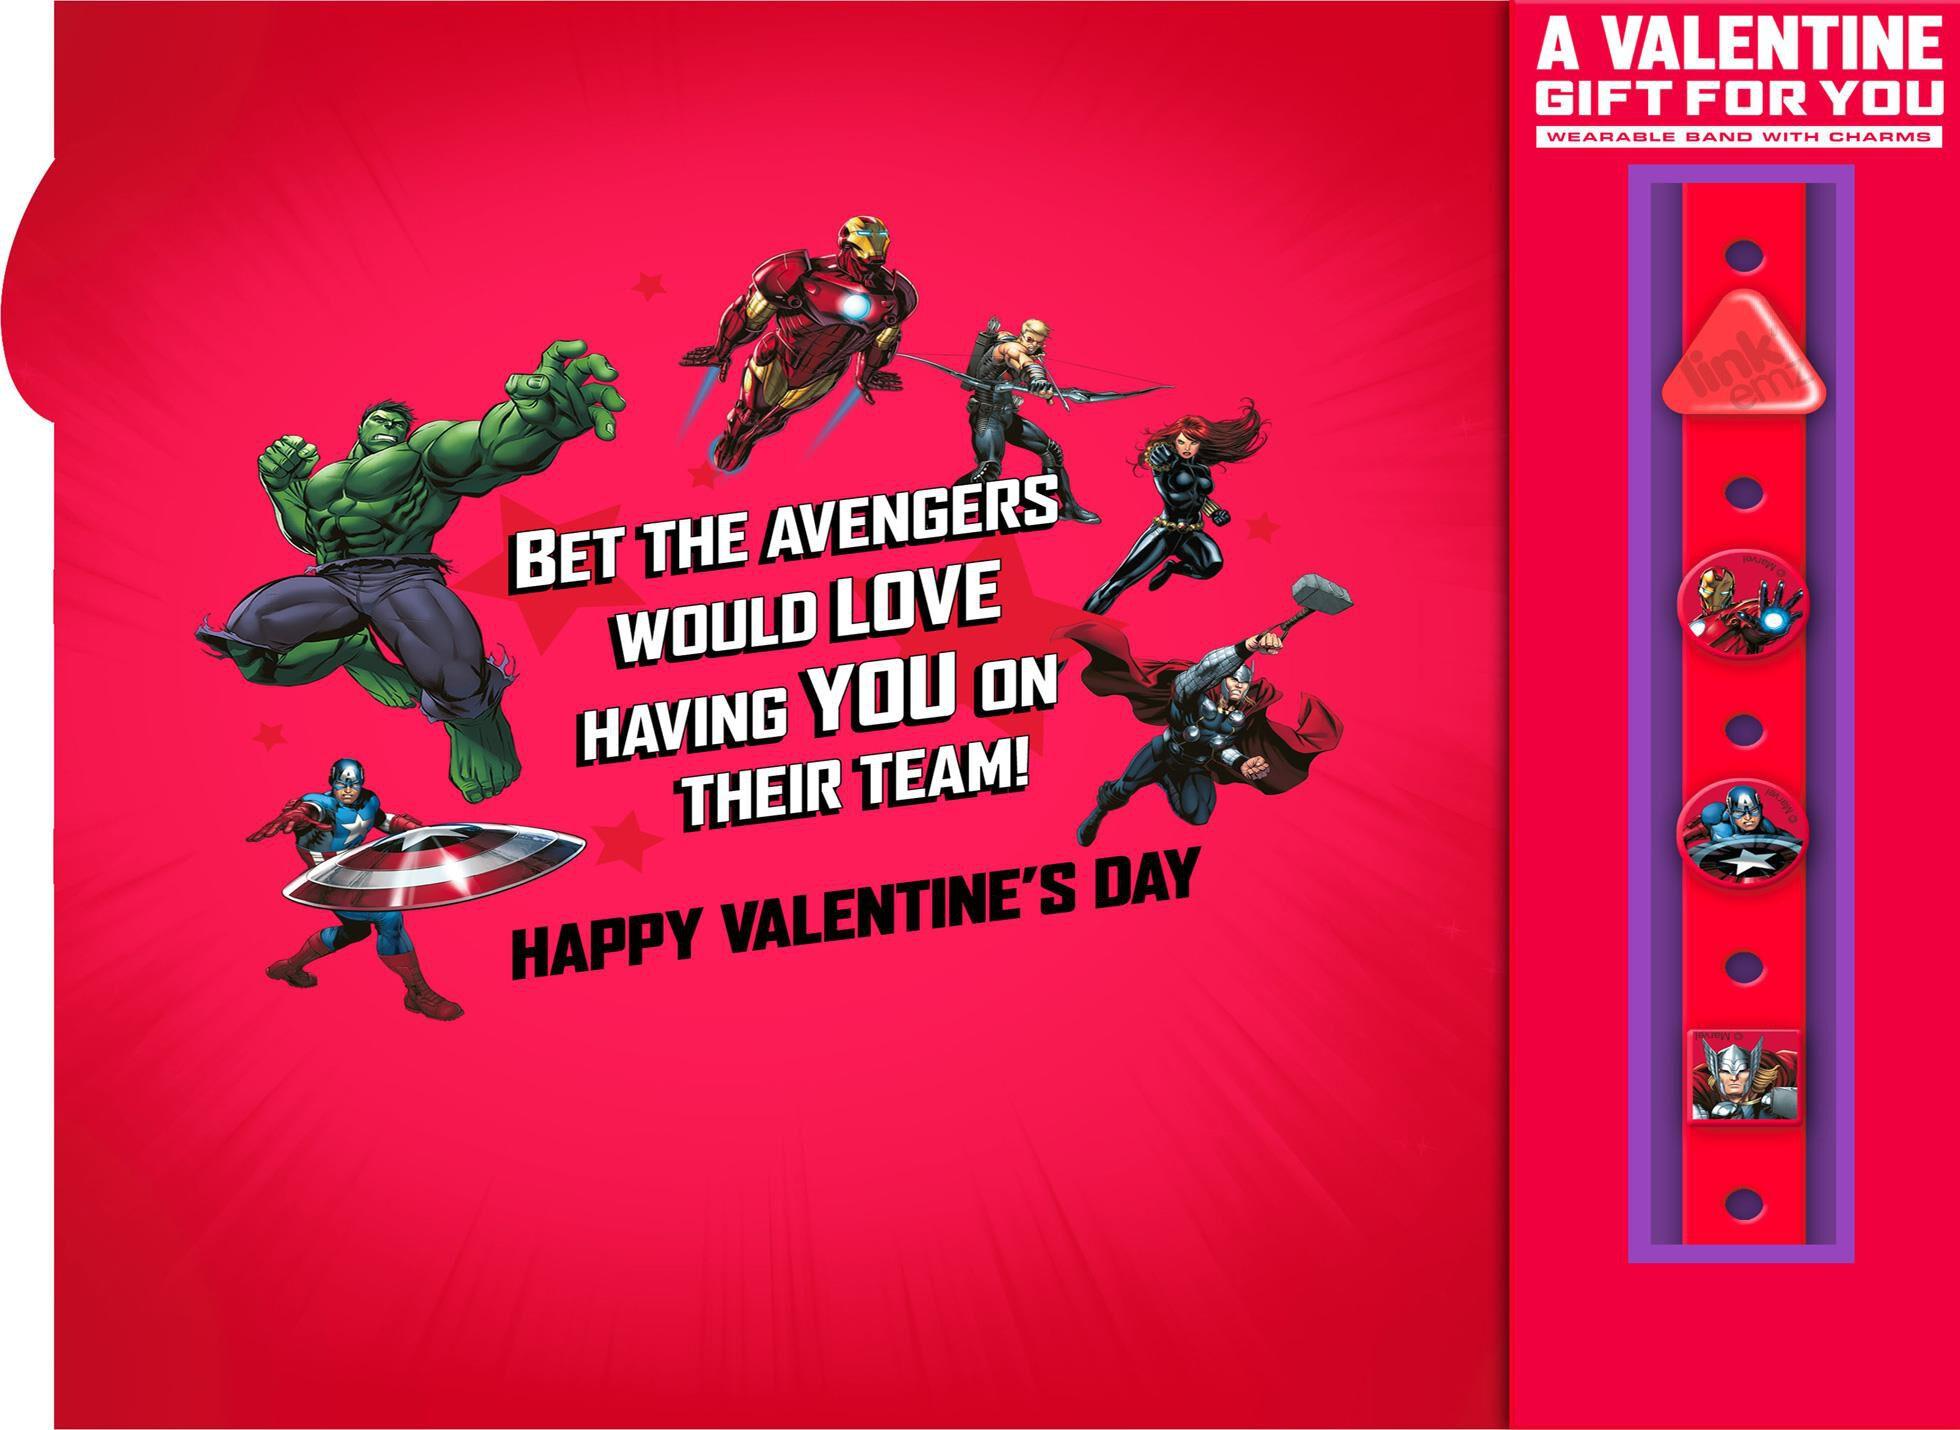 Marvel Avengers Valentineu0027s Day Card With Linku0027emz Wristband